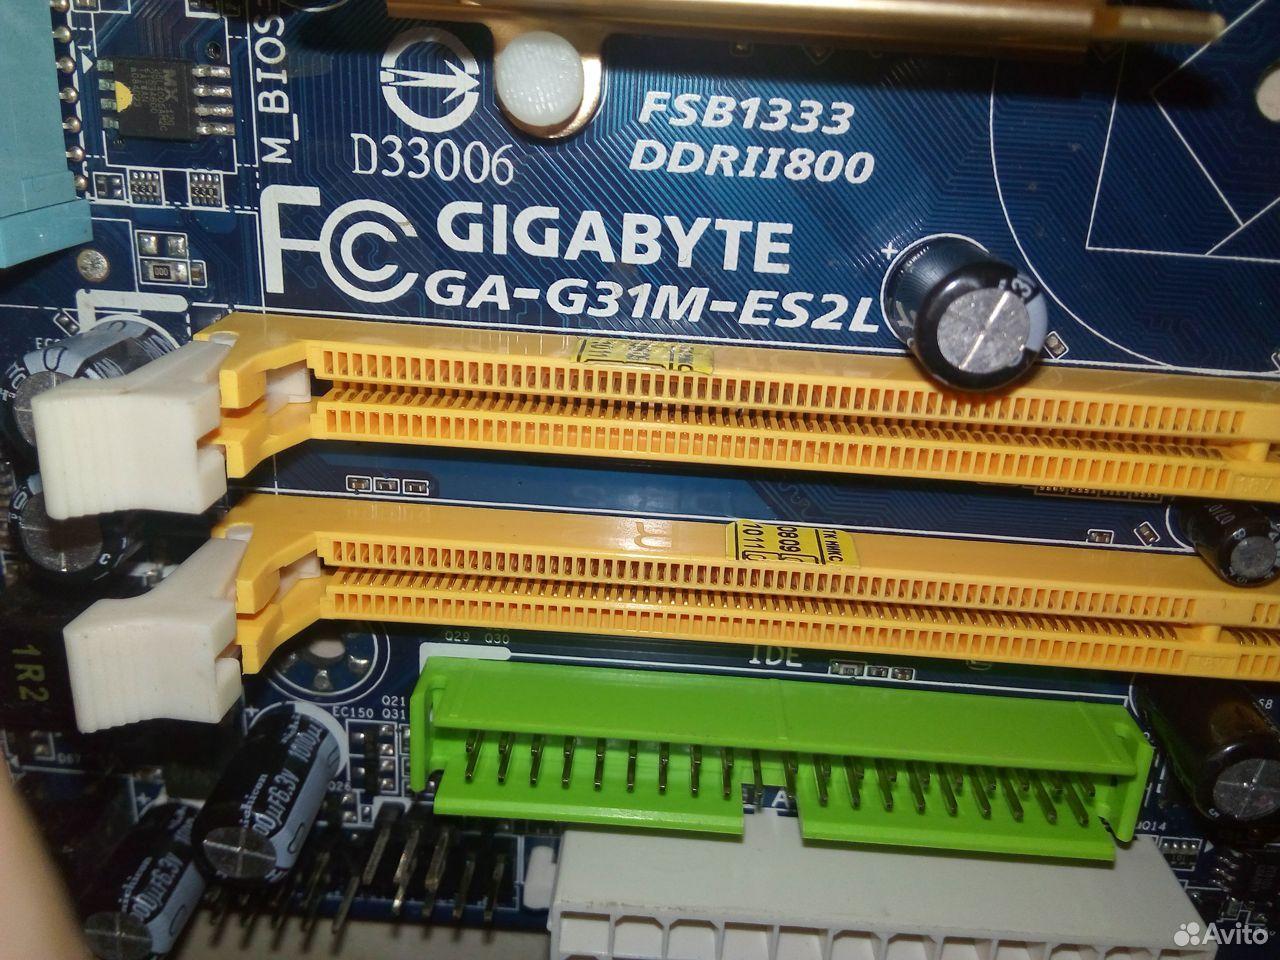 Gigabyte ga-g31m-es2l